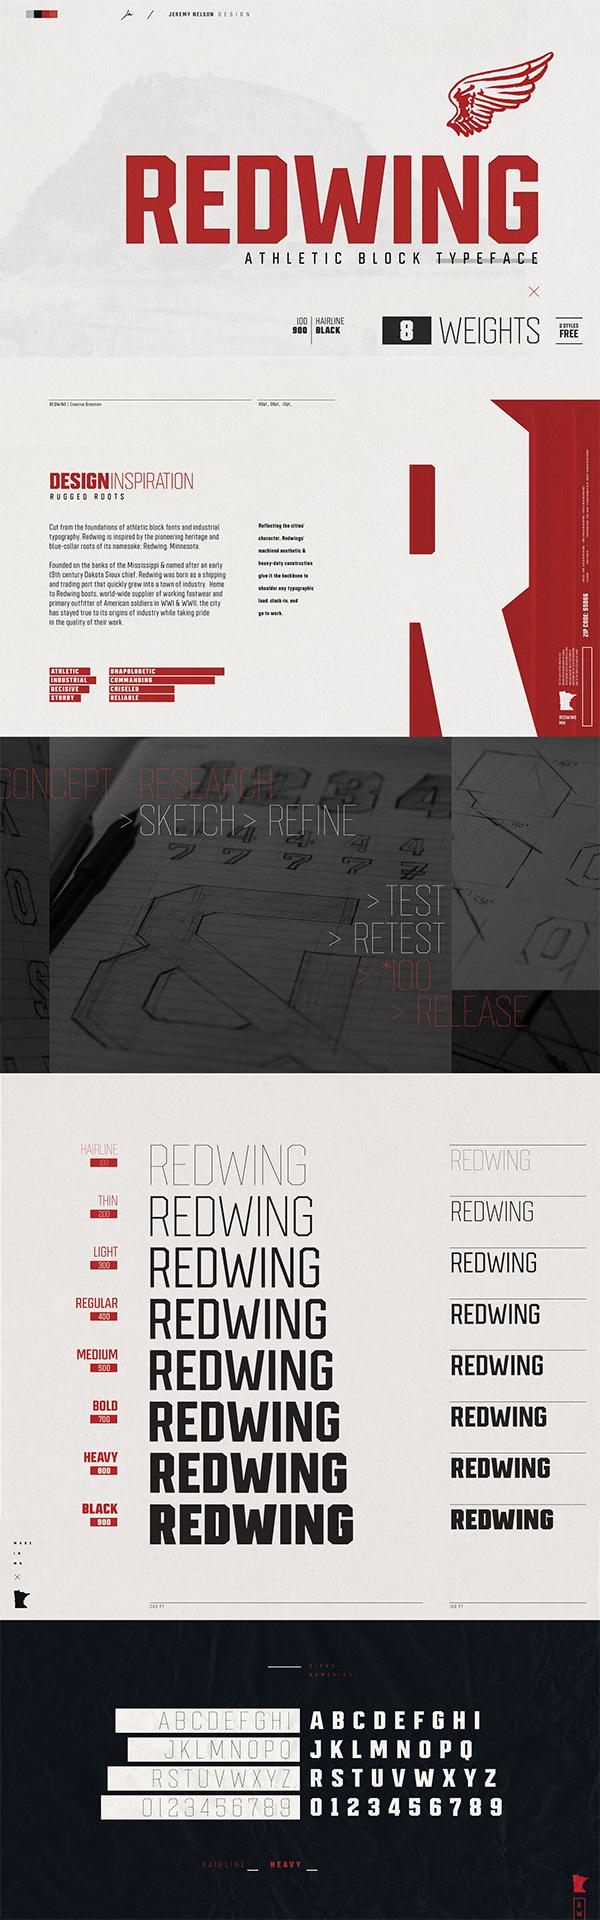 Redwing Free Font